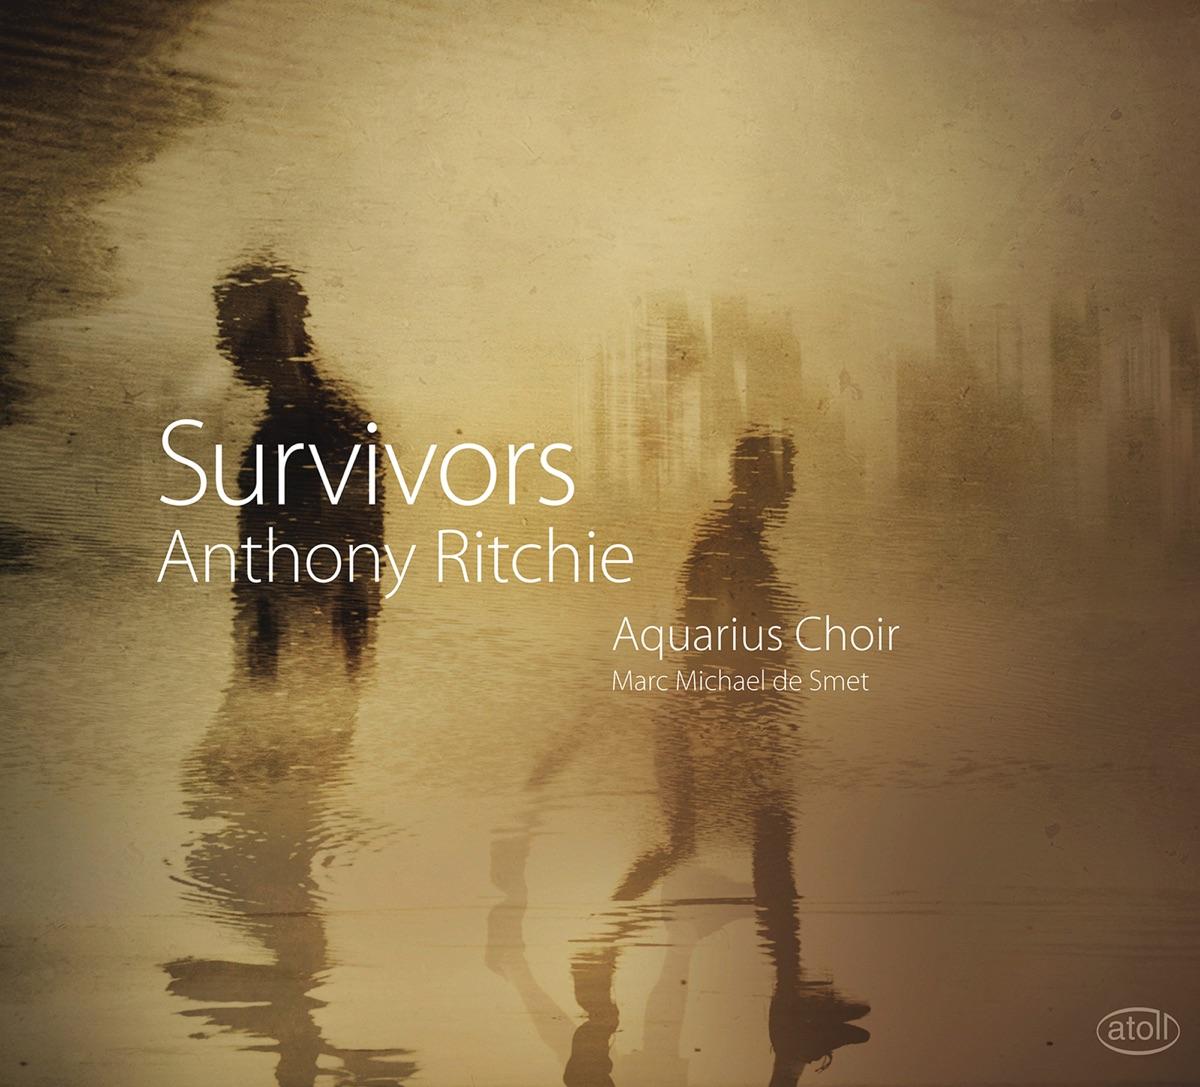 Ritchie Survivors Aquarius  Marc Michael de Smet CD cover